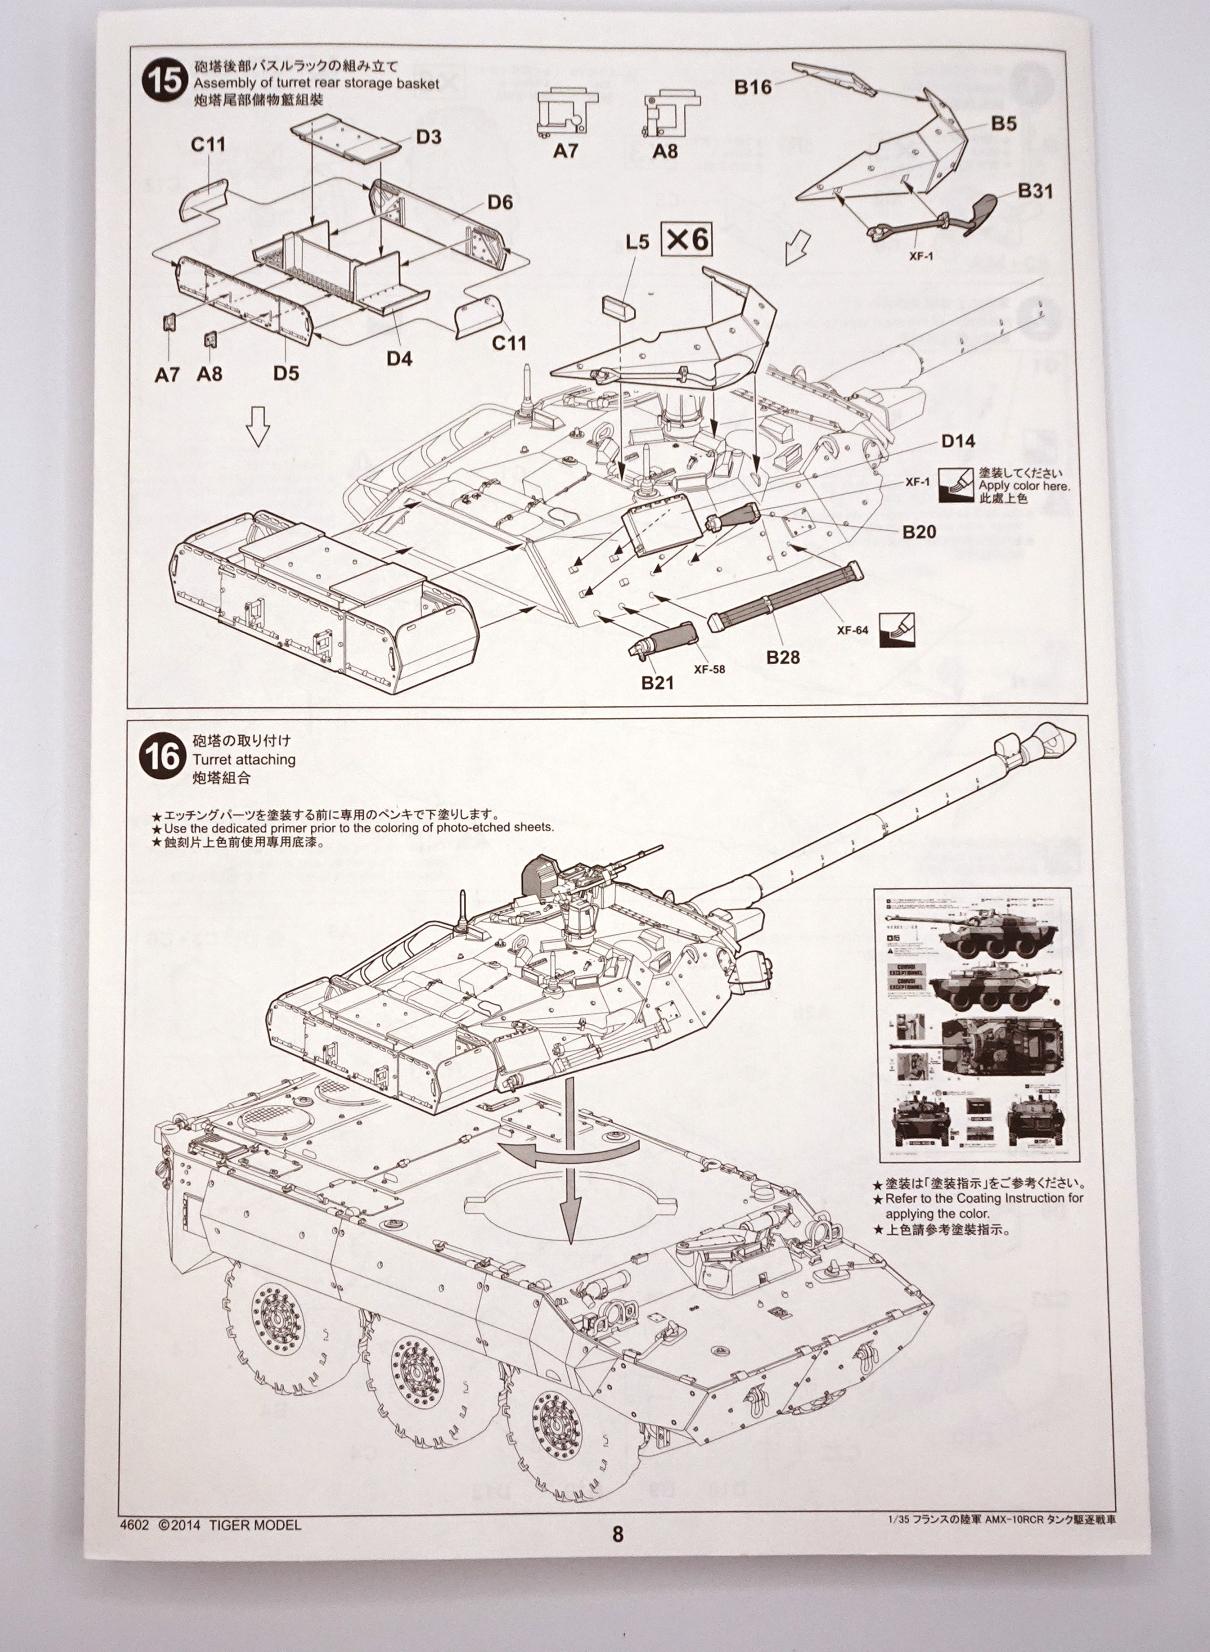 [Tiger Model] AMX-10RCR réf. 4602 - 1/35 Amx10-plan-5